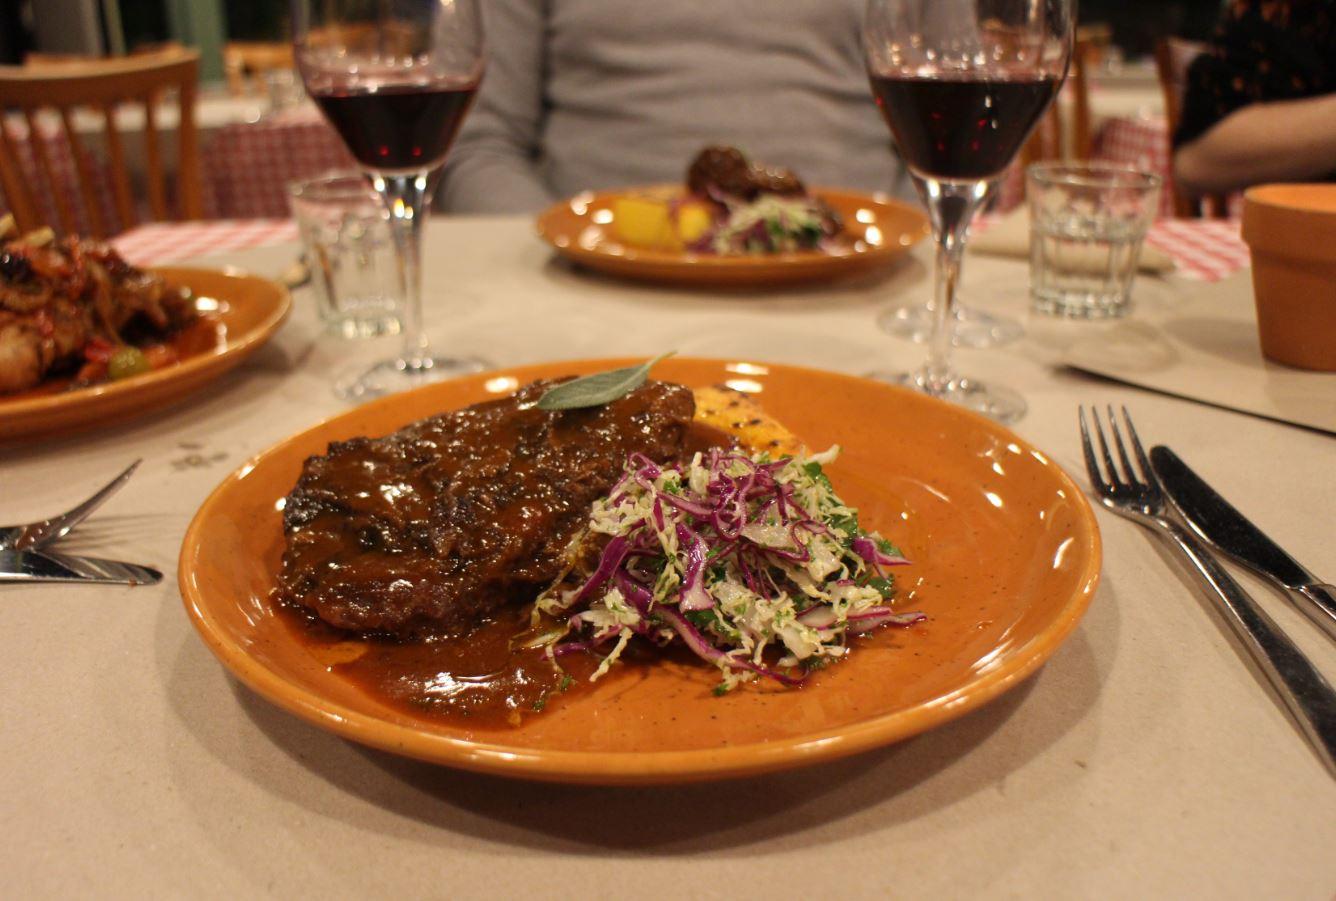 Slow cooked beef cheeks, red wine gravy, grilled polenta and Italian coleslaw